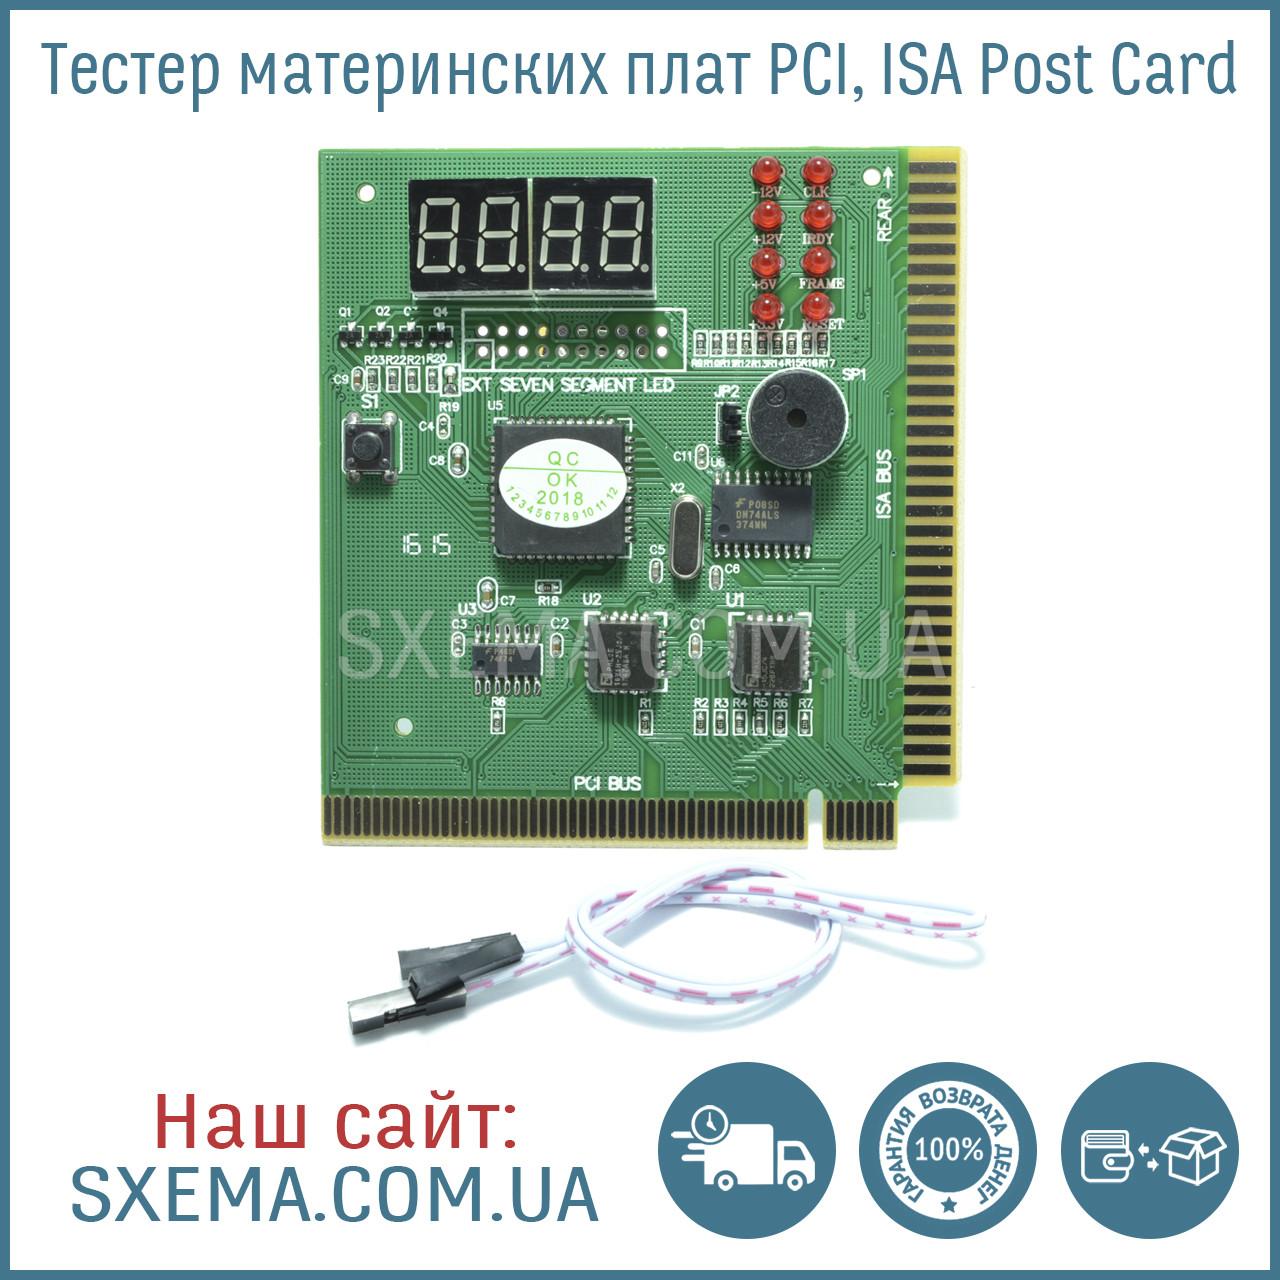 Тестер материнских плат PCI, ISA Post Card